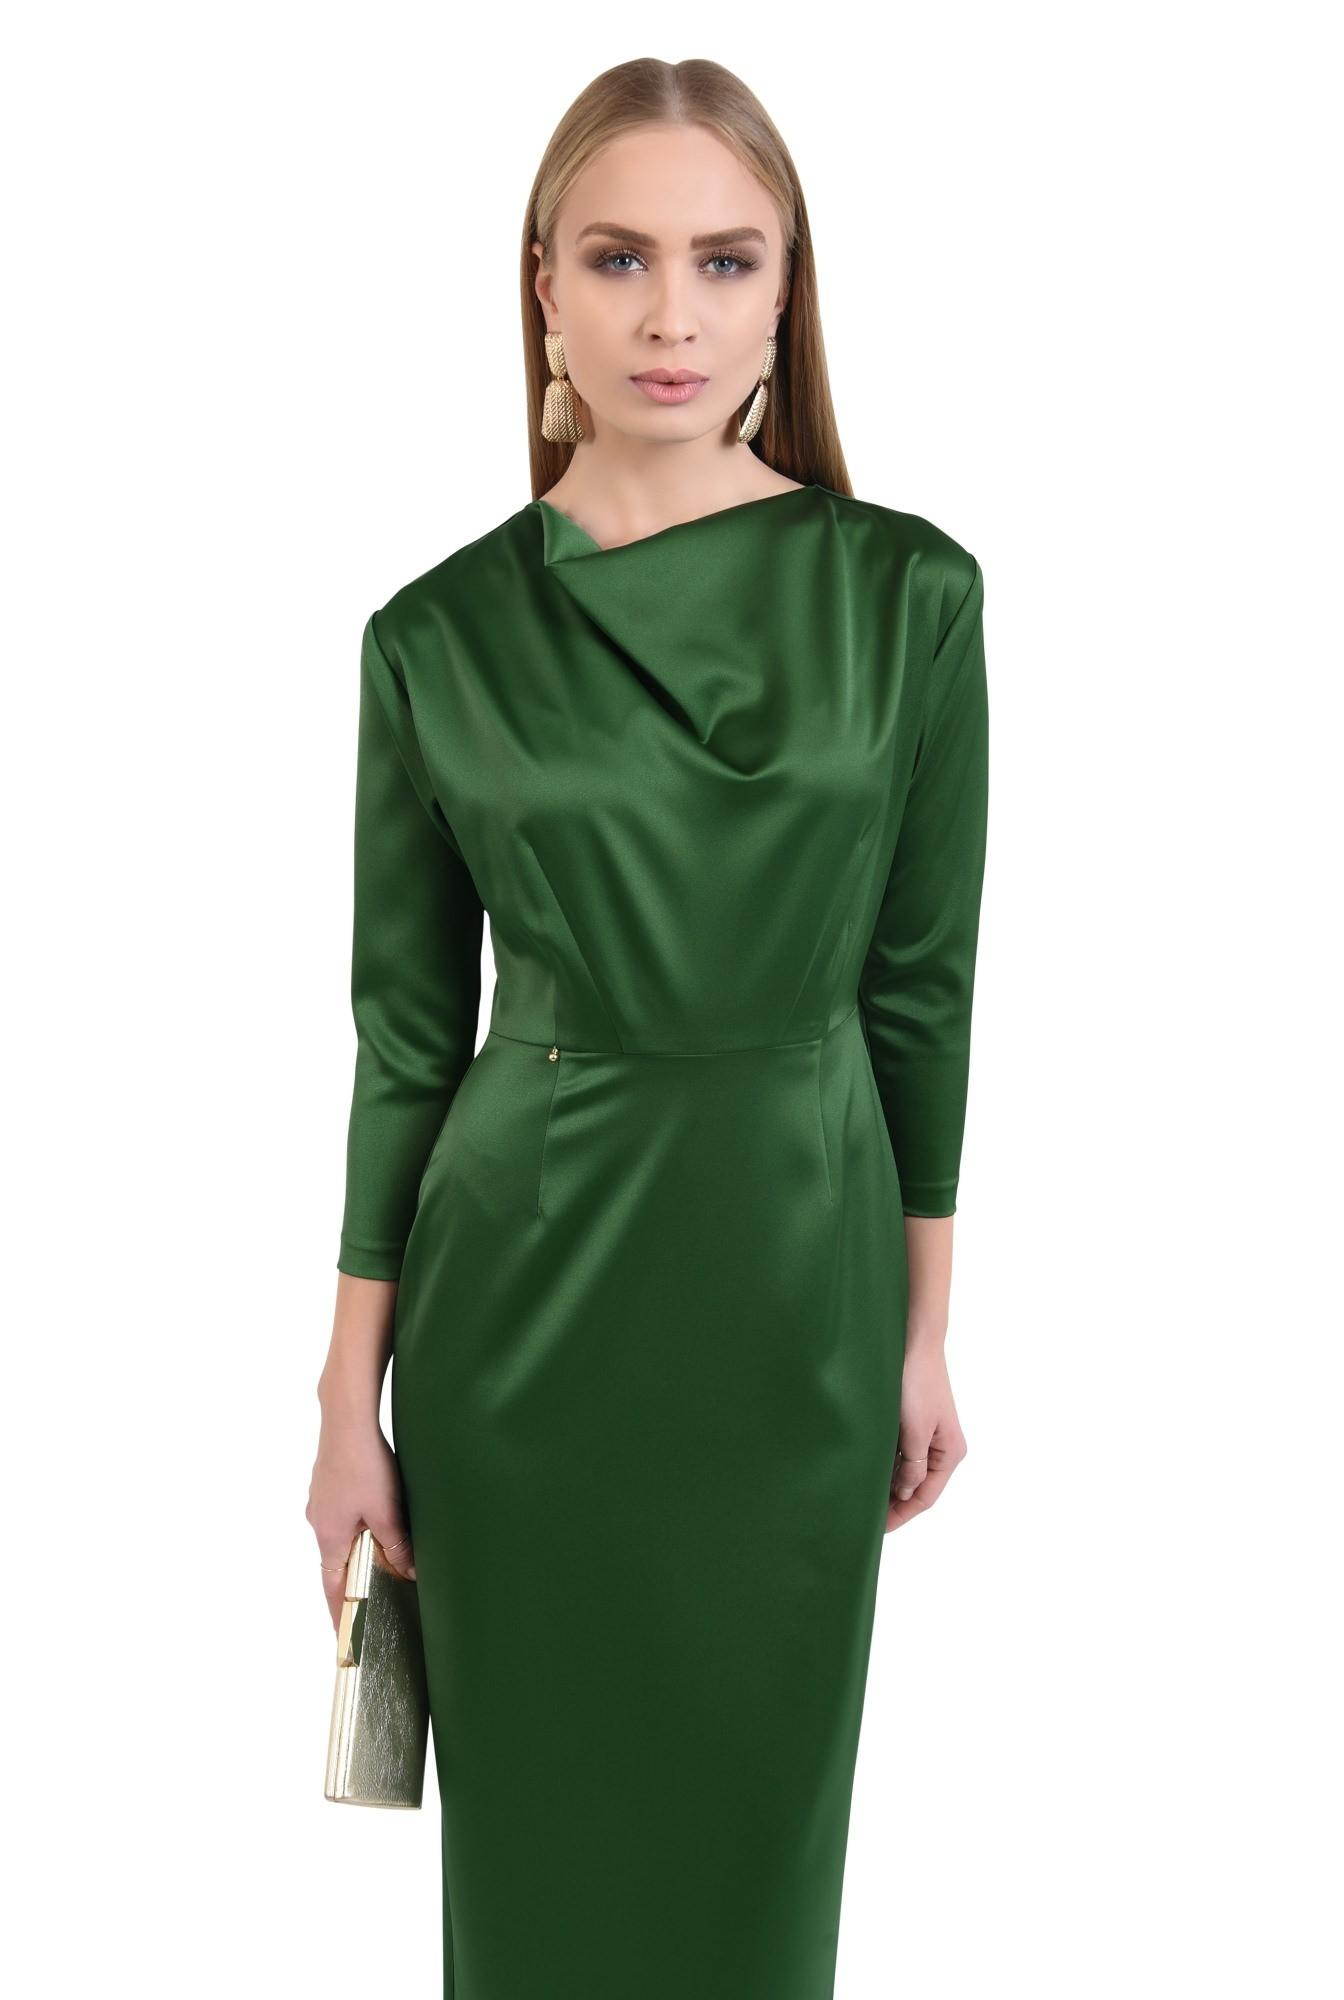 rochie de ocazie, verde, maneci ajustate, drapata la decolteu